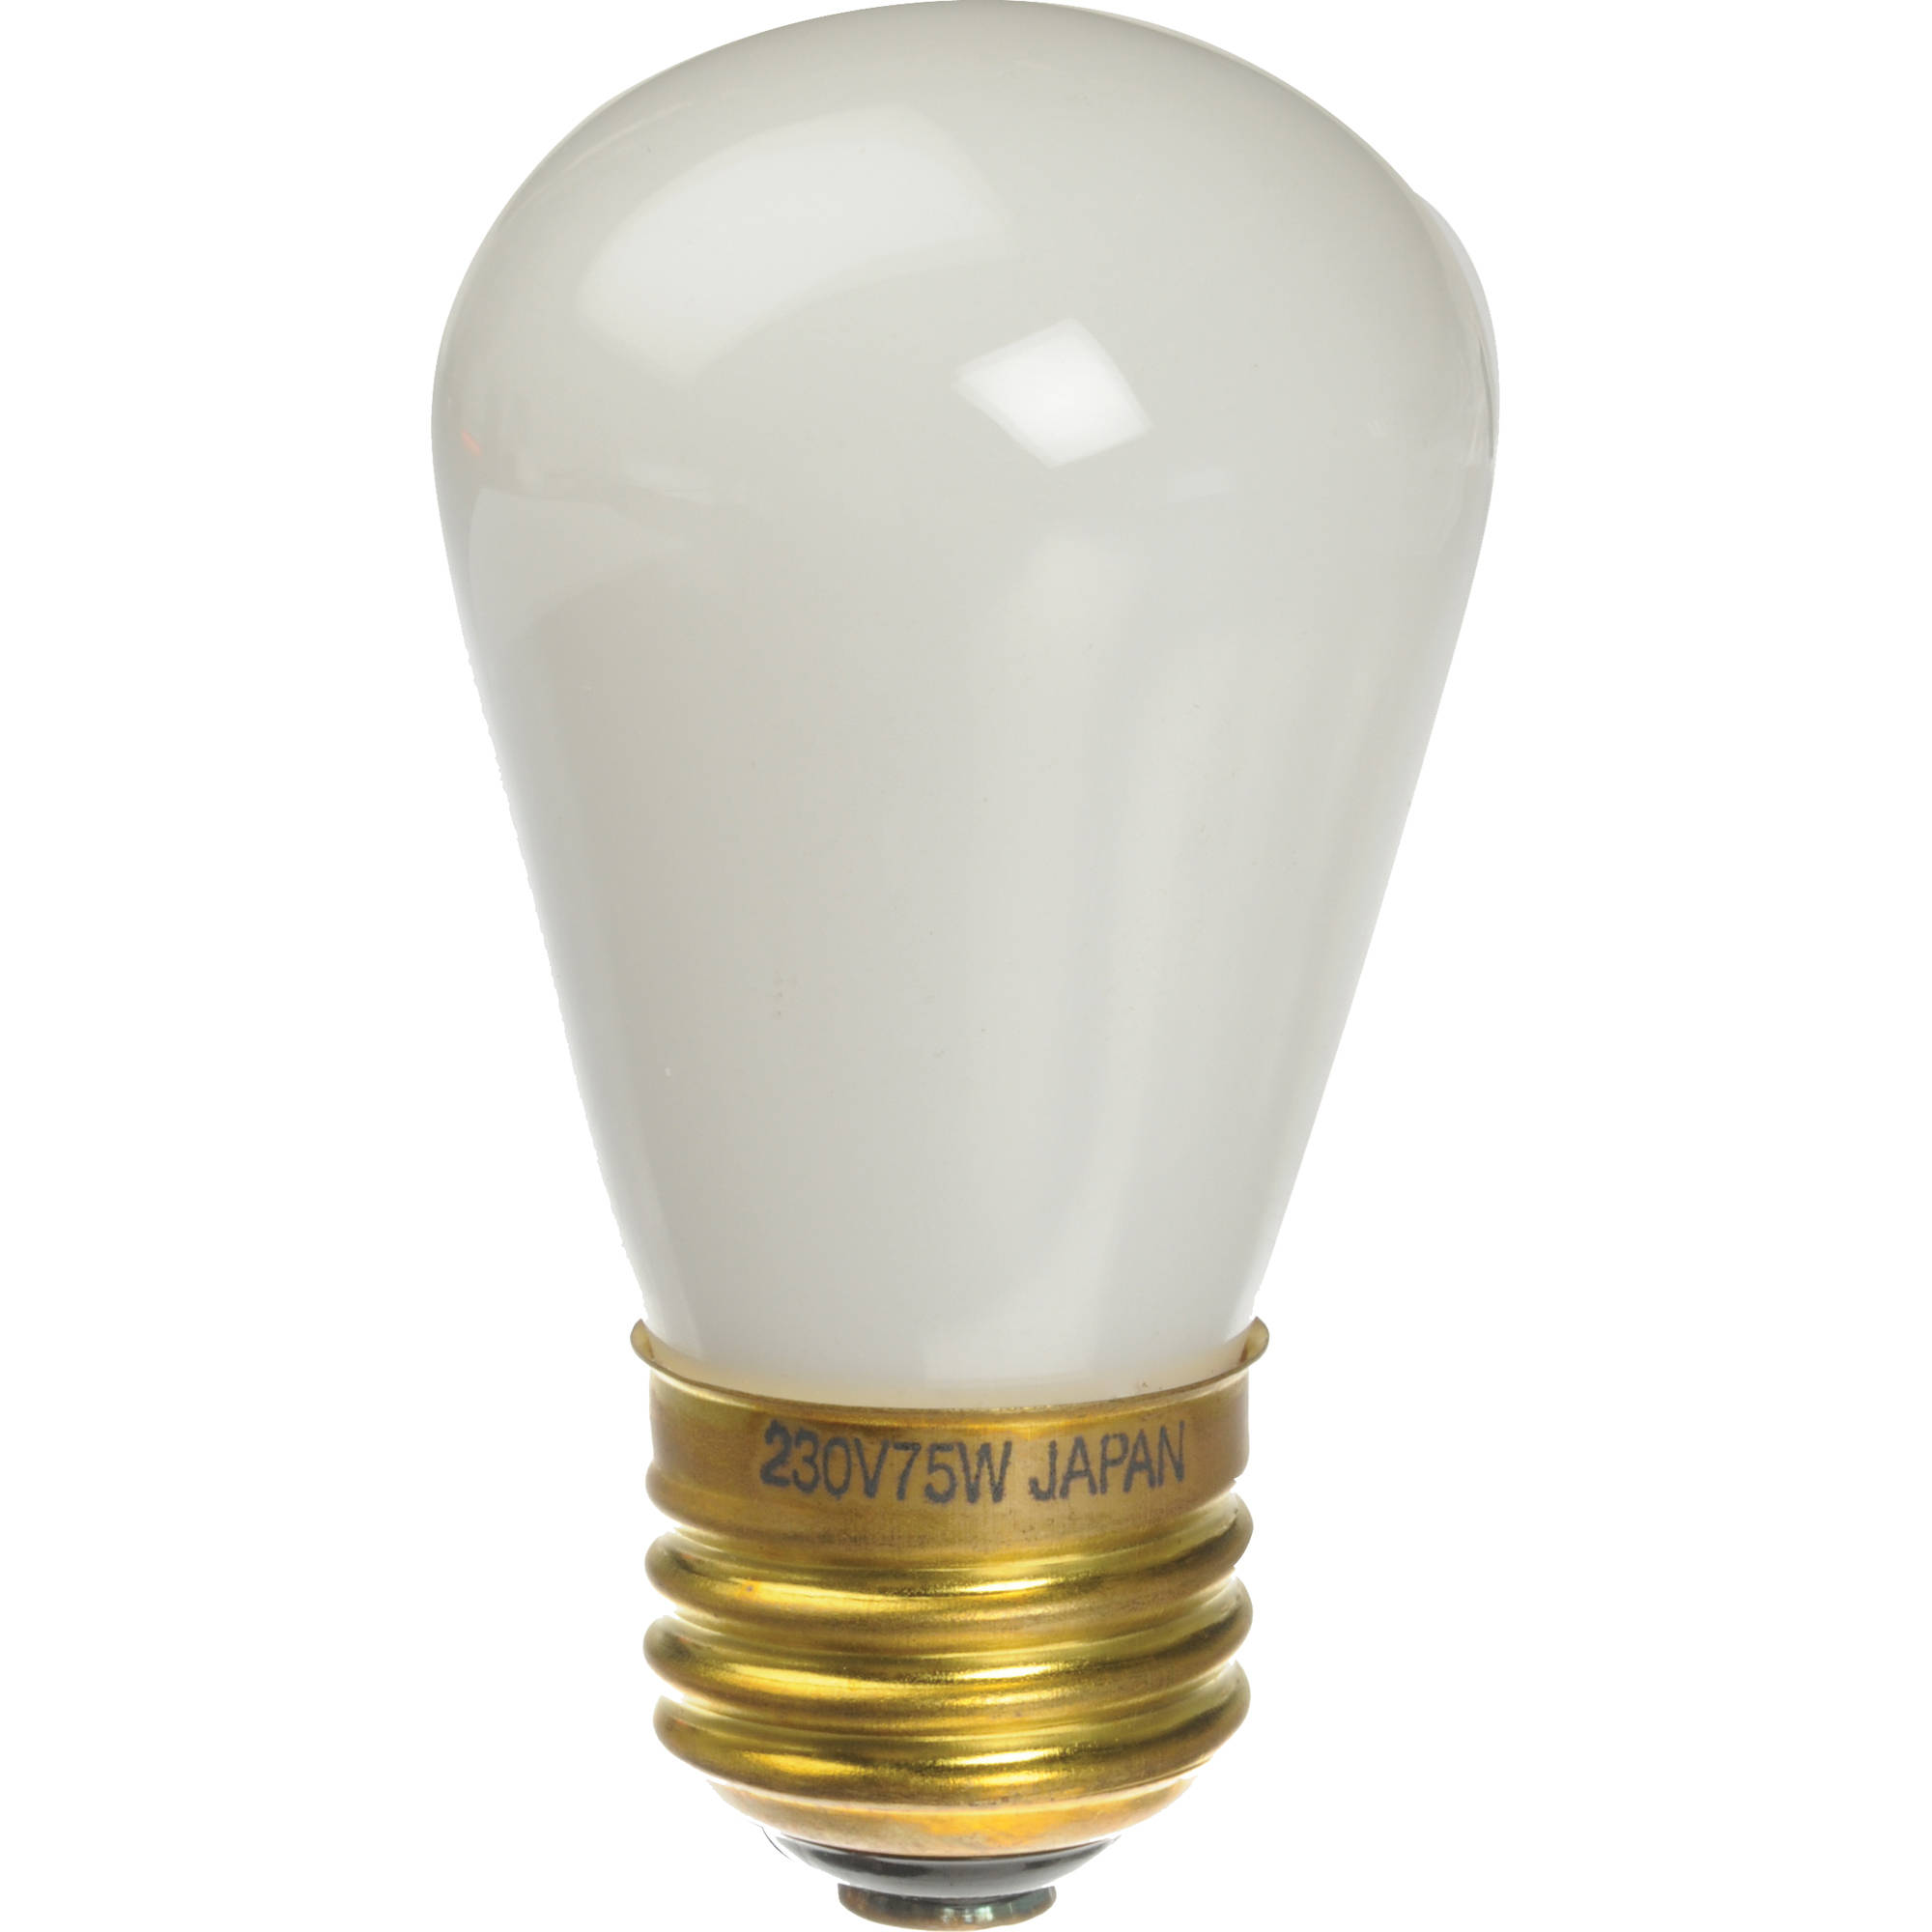 Omega PH1400 Lamp - 75 watts/220 volts - for C700, C760, B600